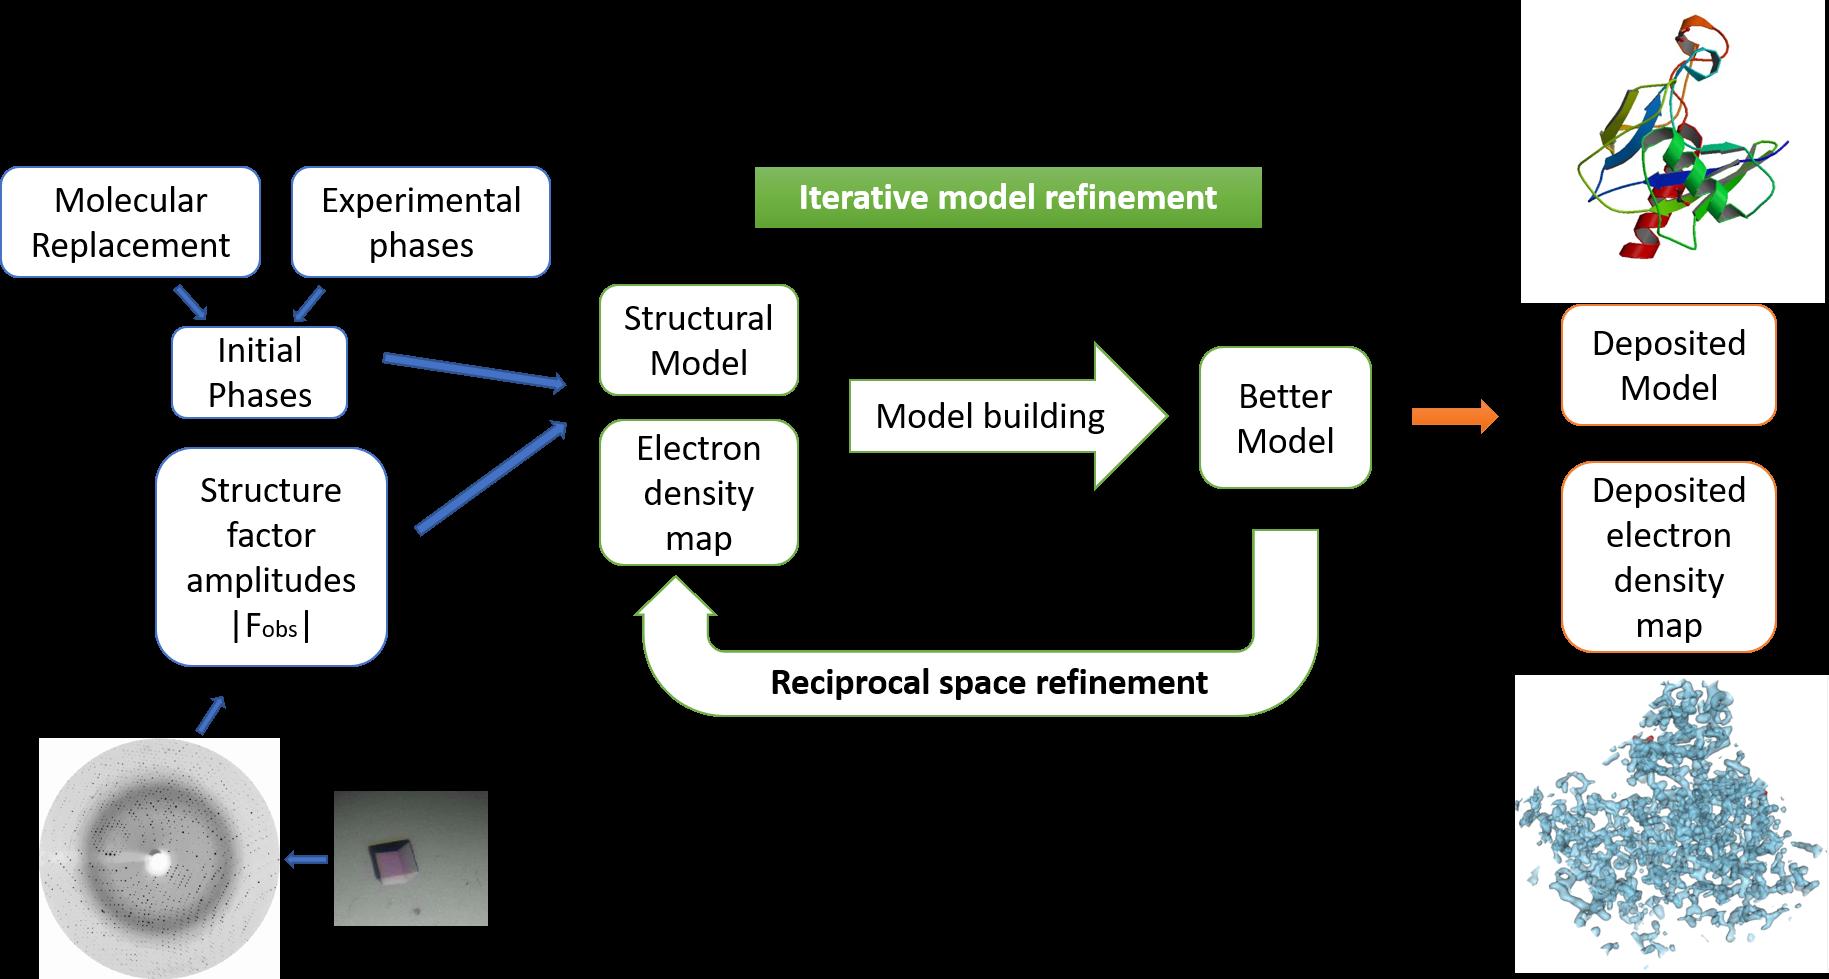 Iterative model refinement